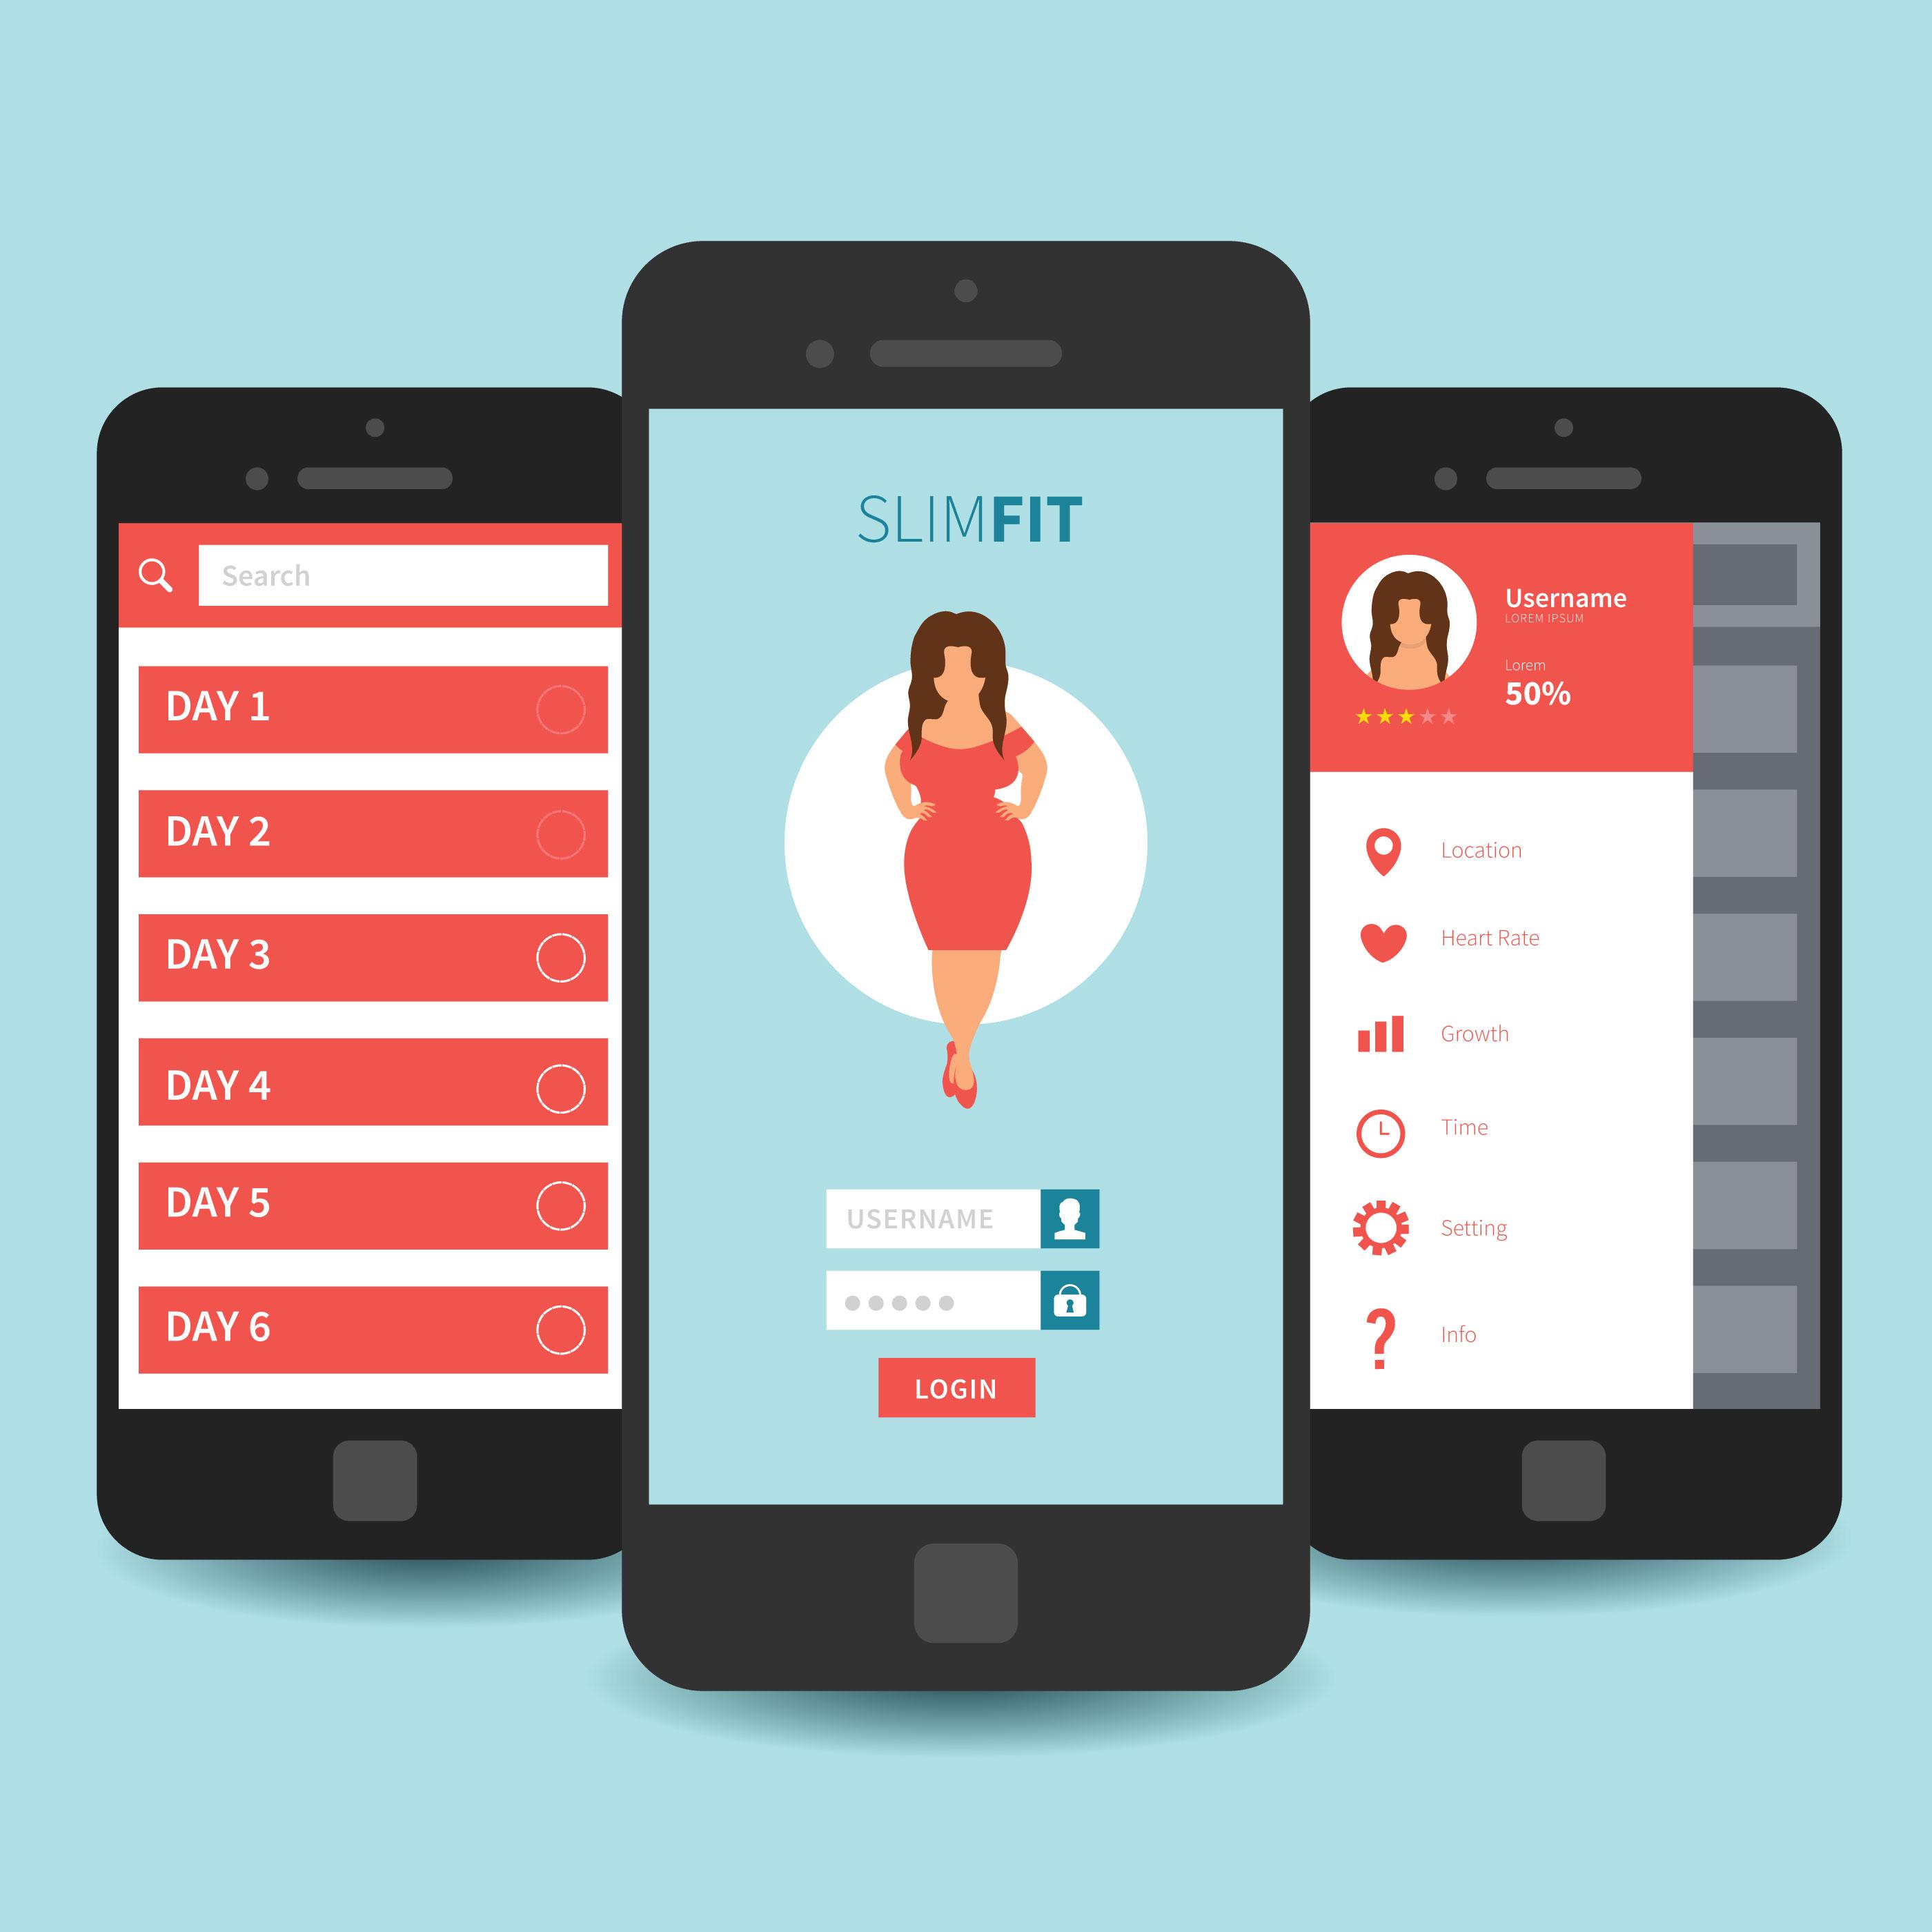 mobile app ui template design download free vector art stock graphics images. Black Bedroom Furniture Sets. Home Design Ideas